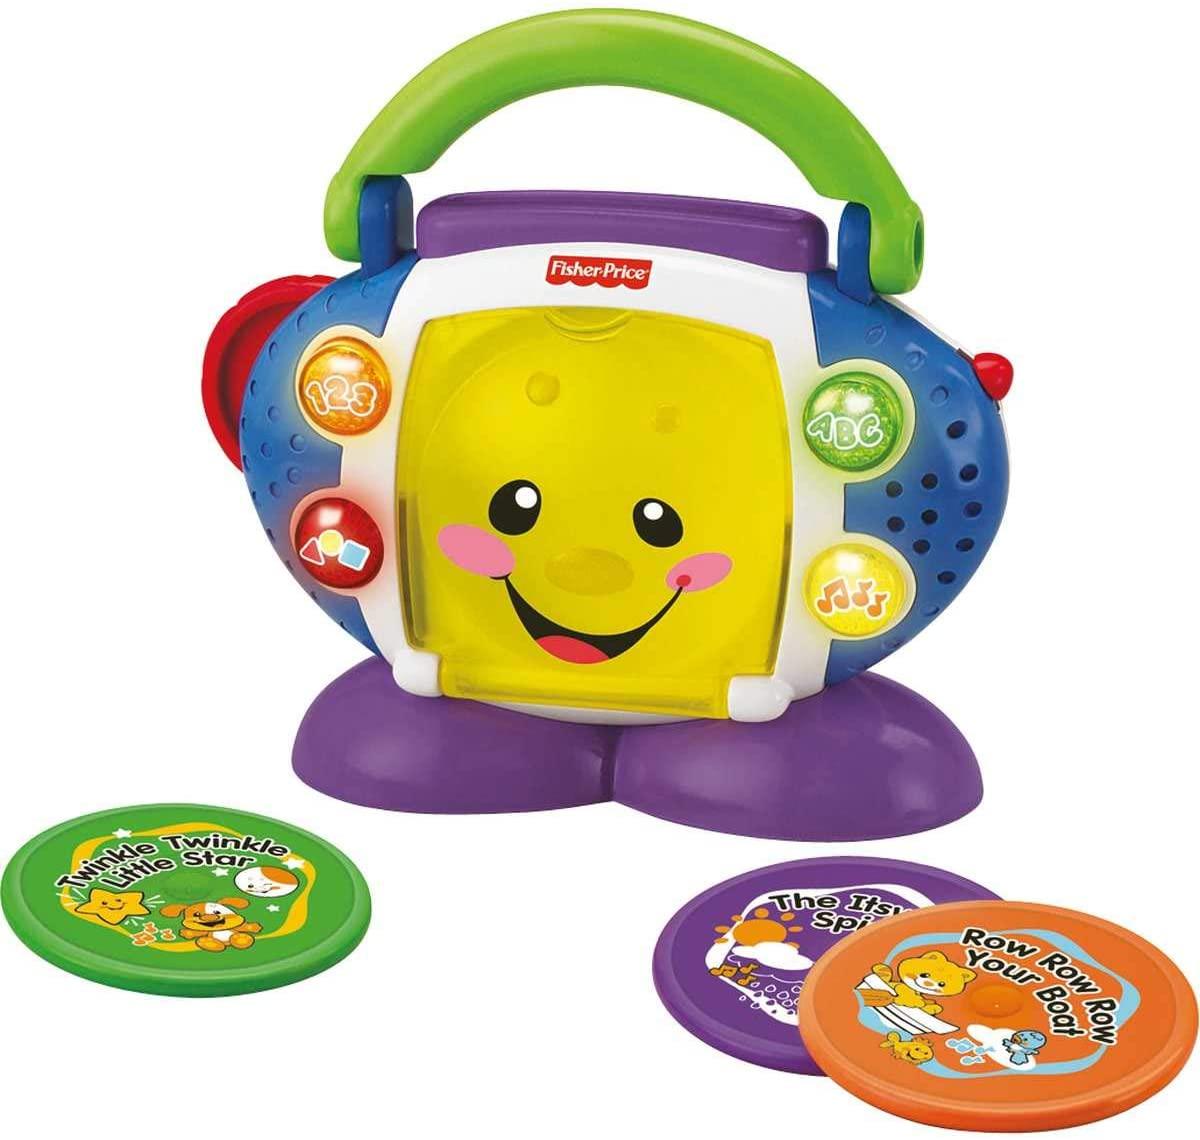 Fisher Price - Aprender e Brincar CD Player